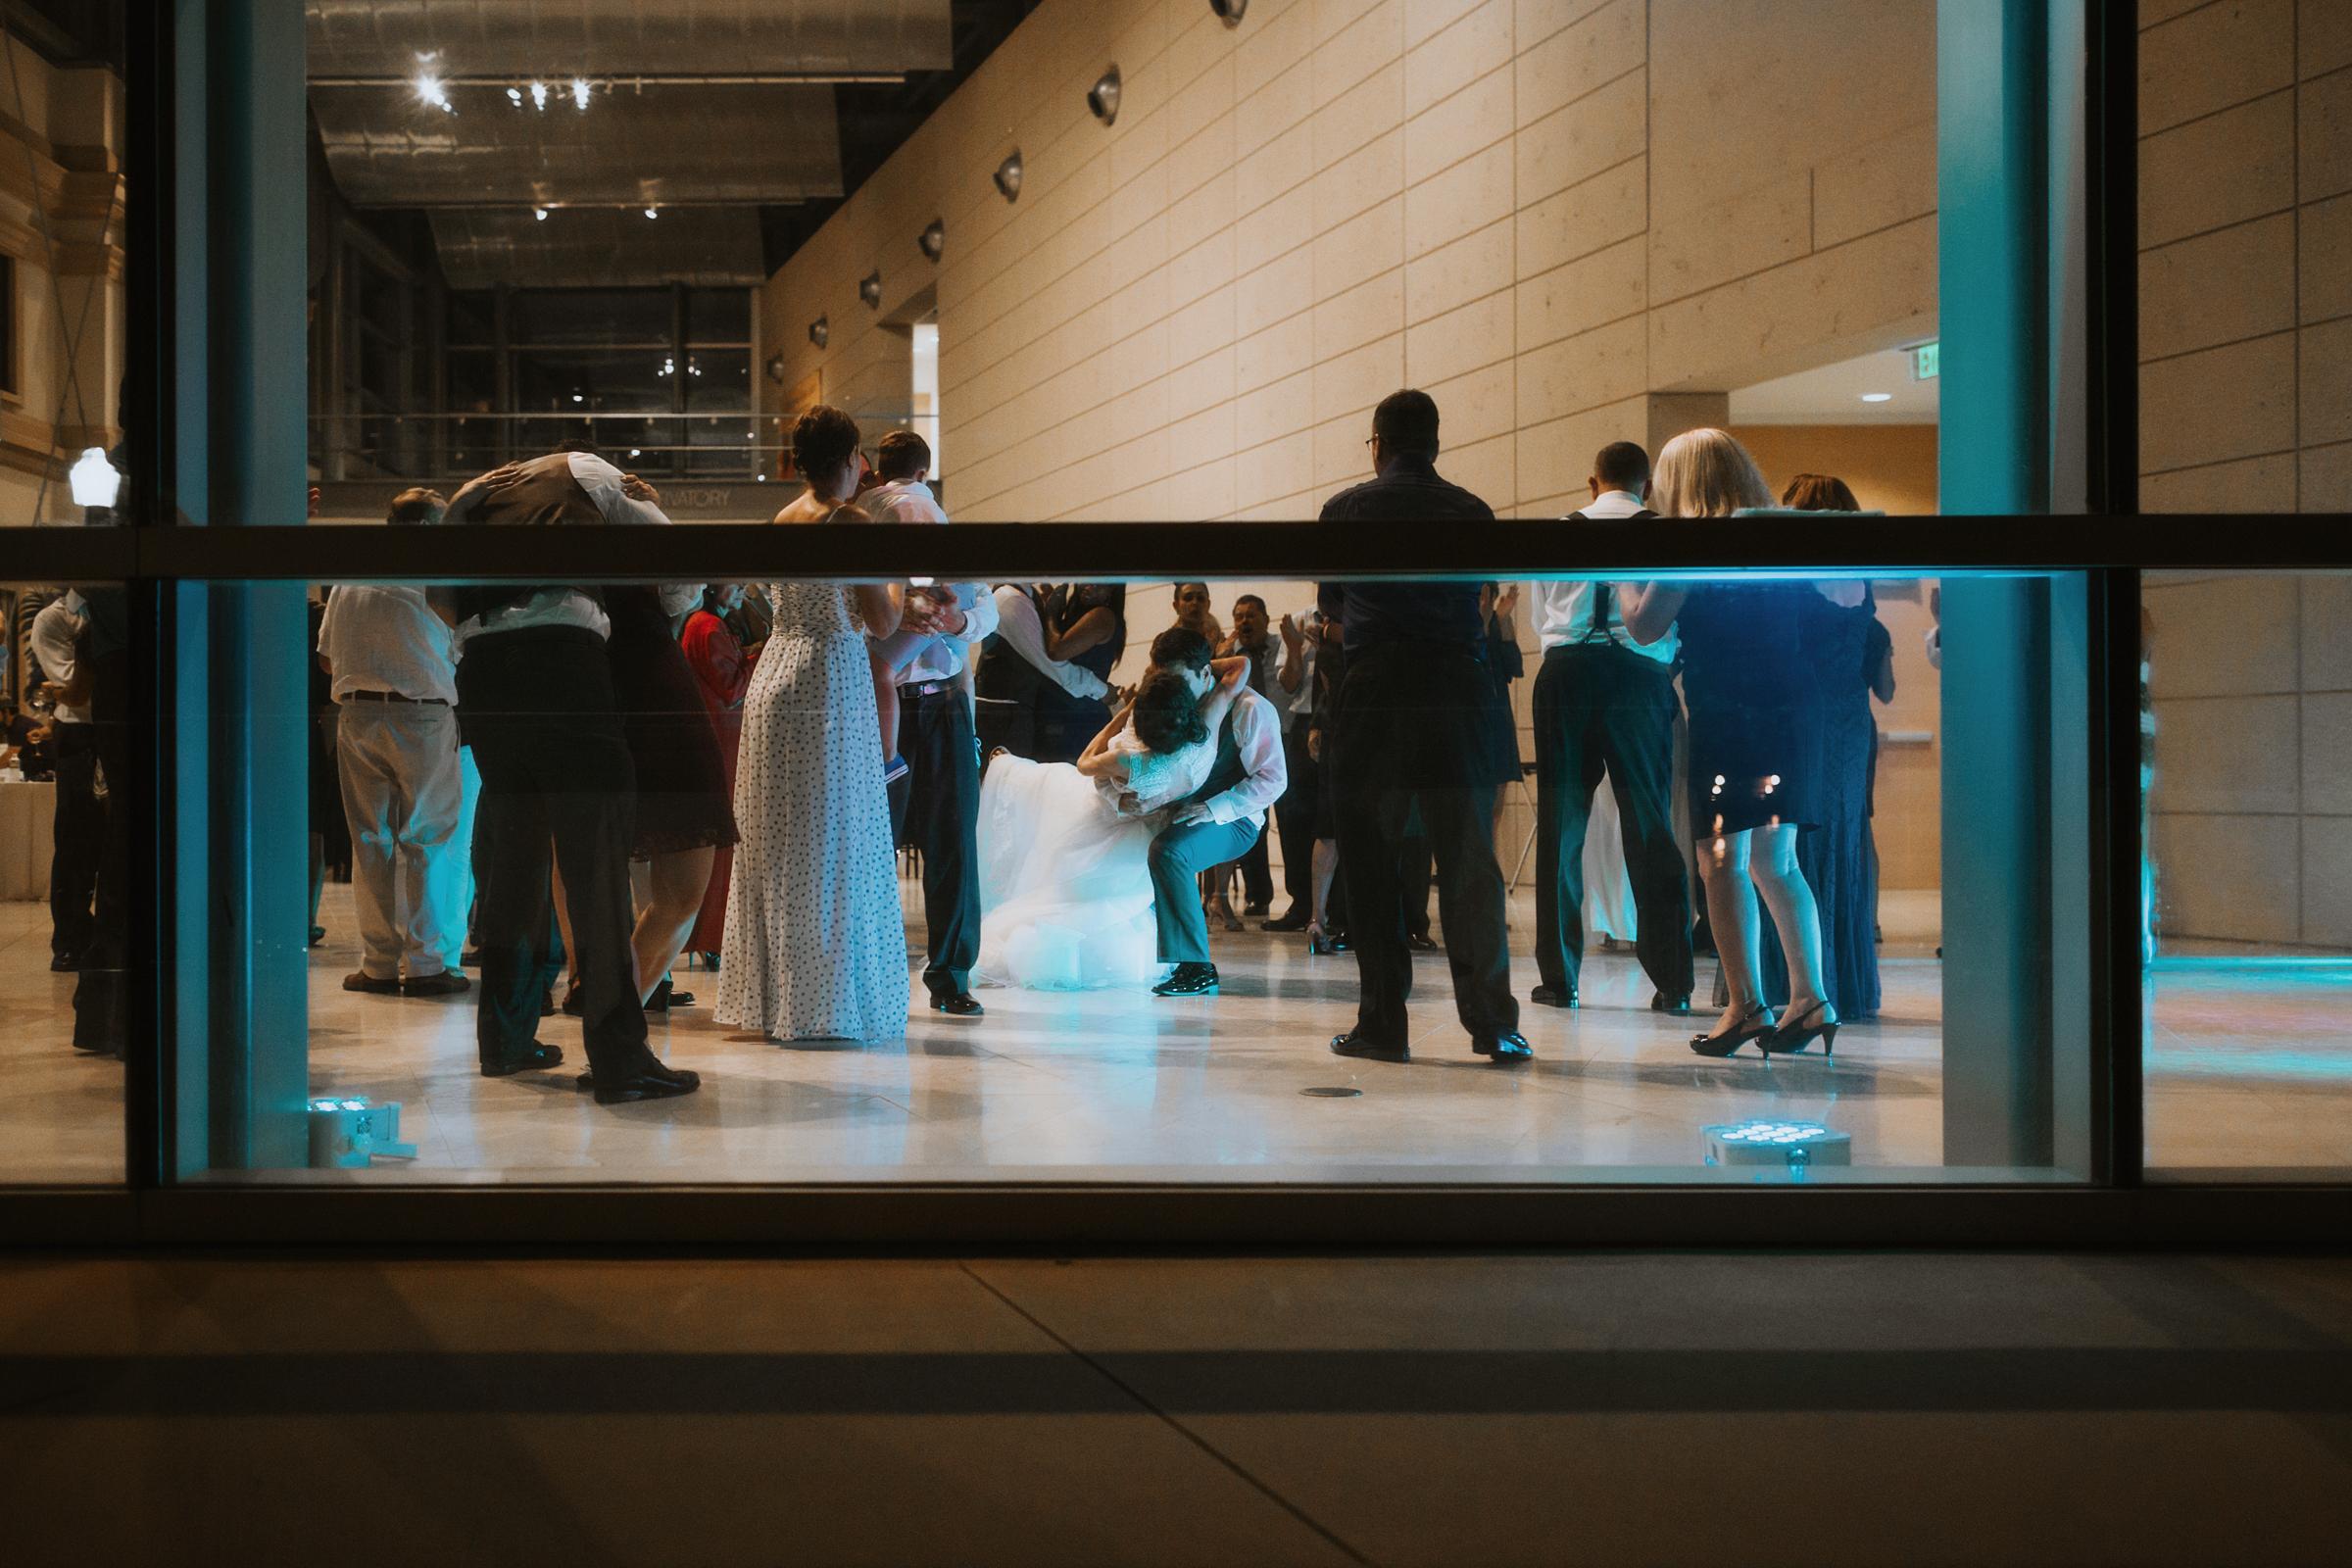 wedding day | MFA St Pete | Vanessa Boy Photography | vanessaboy.com-763.com |final.jpg